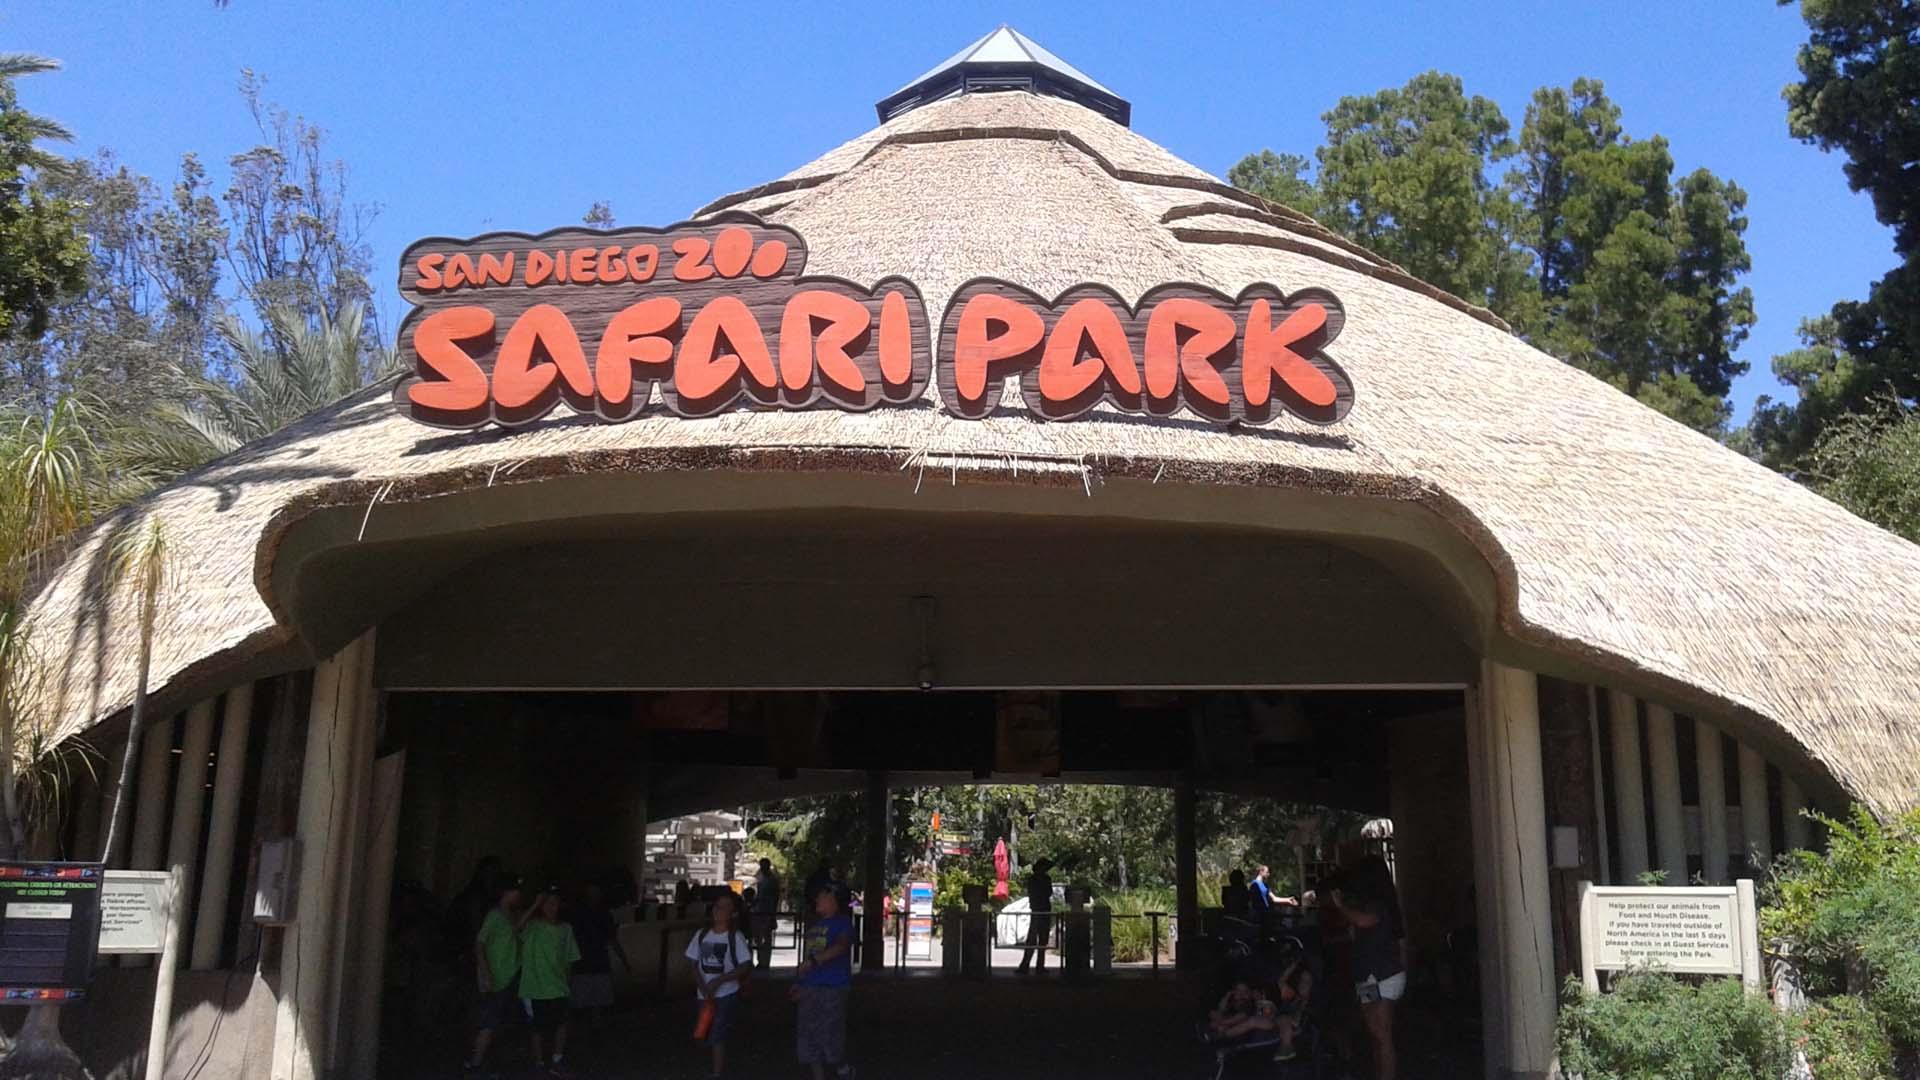 San Diego Zoo Safari Park | Sandi Hemmerlein